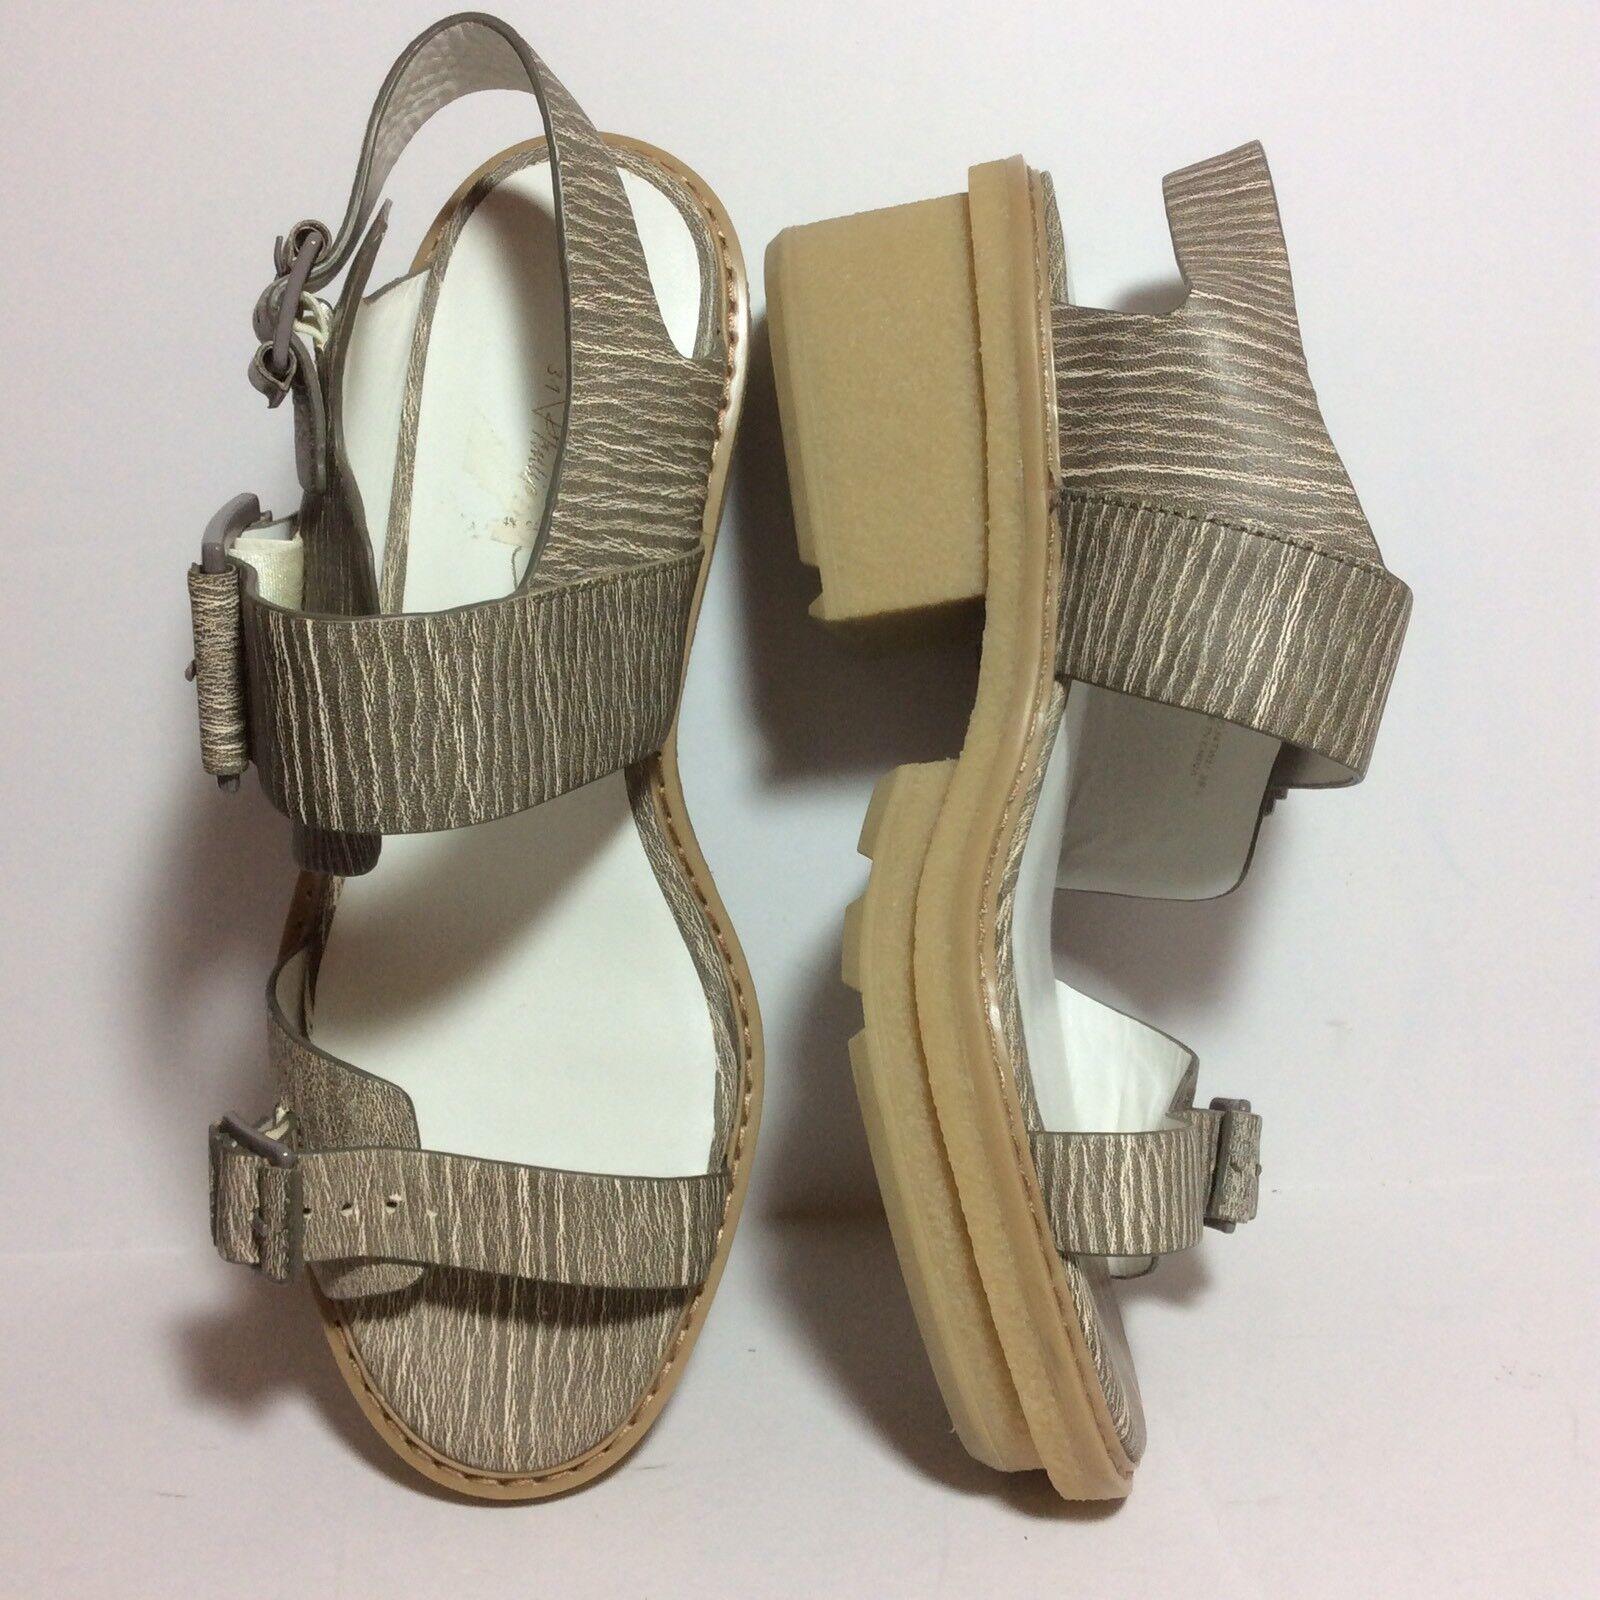 Nuova 495 3.1 Phillip Lim Mallory  Chunky Platform Sandals Beige Sz 39.5 o 9.5  punto vendita